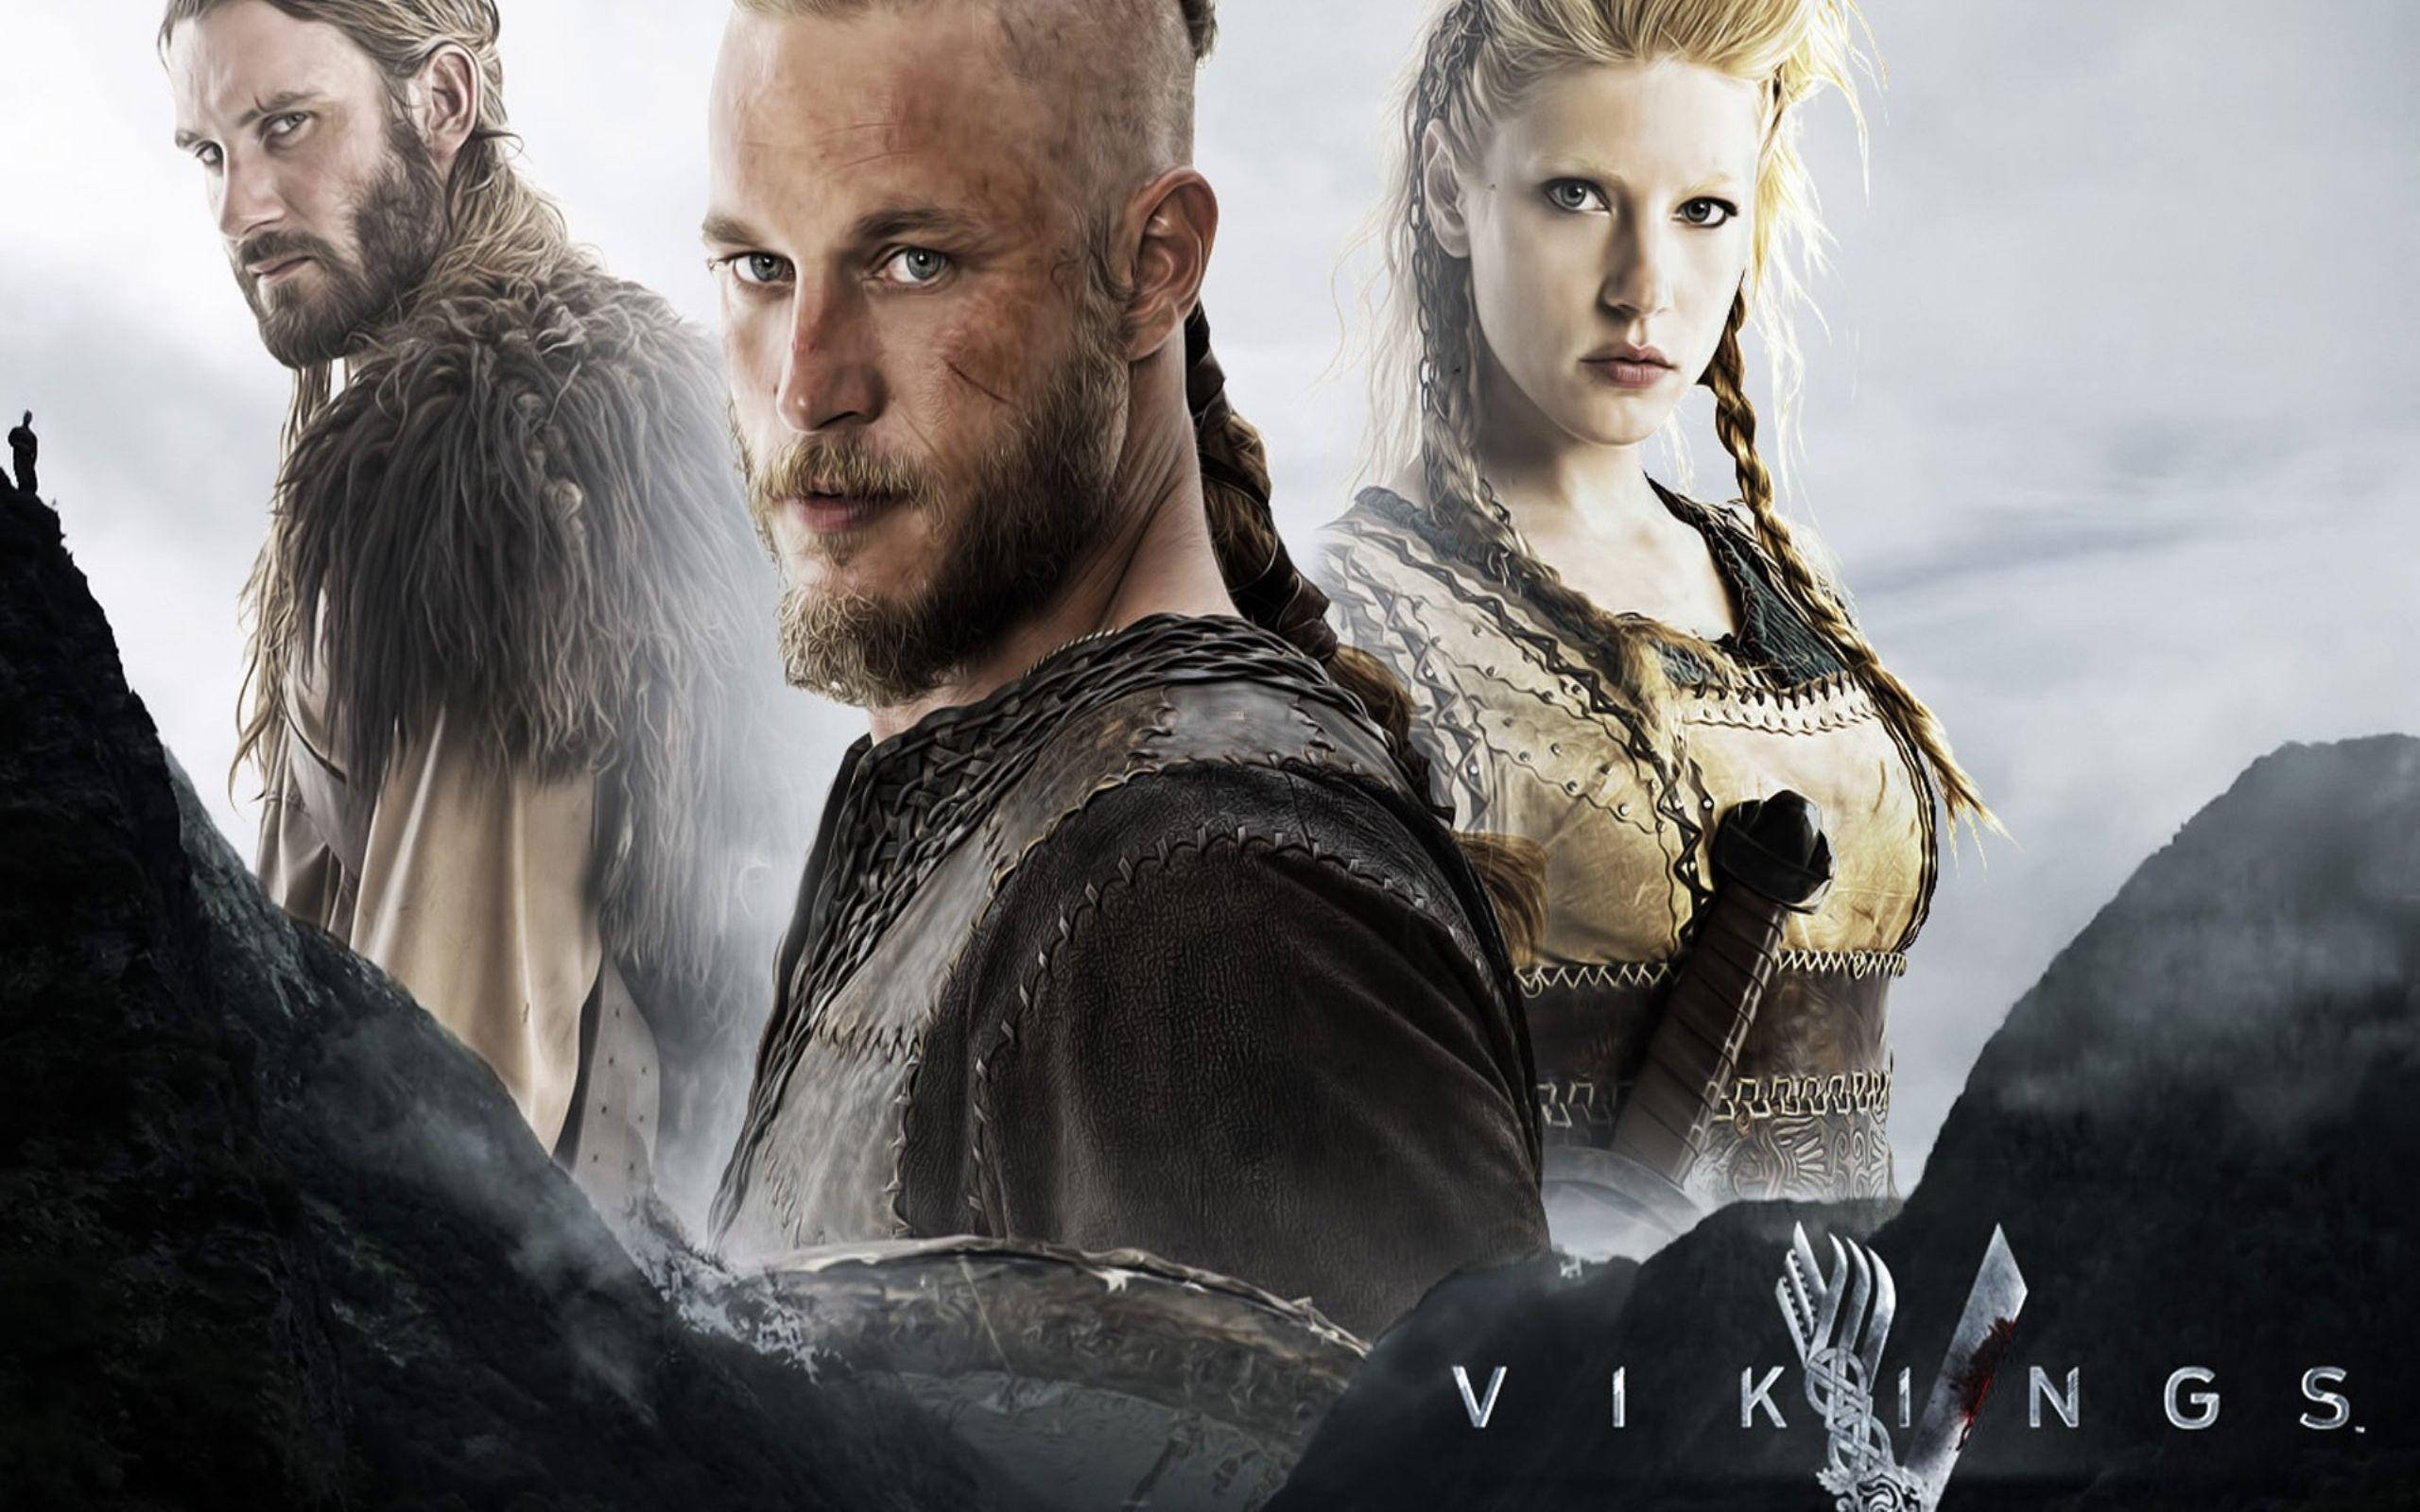 Vikings tv wallpaper 3d wallpapers pinterest vikings tv 3d vikings tv wallpaper voltagebd Images